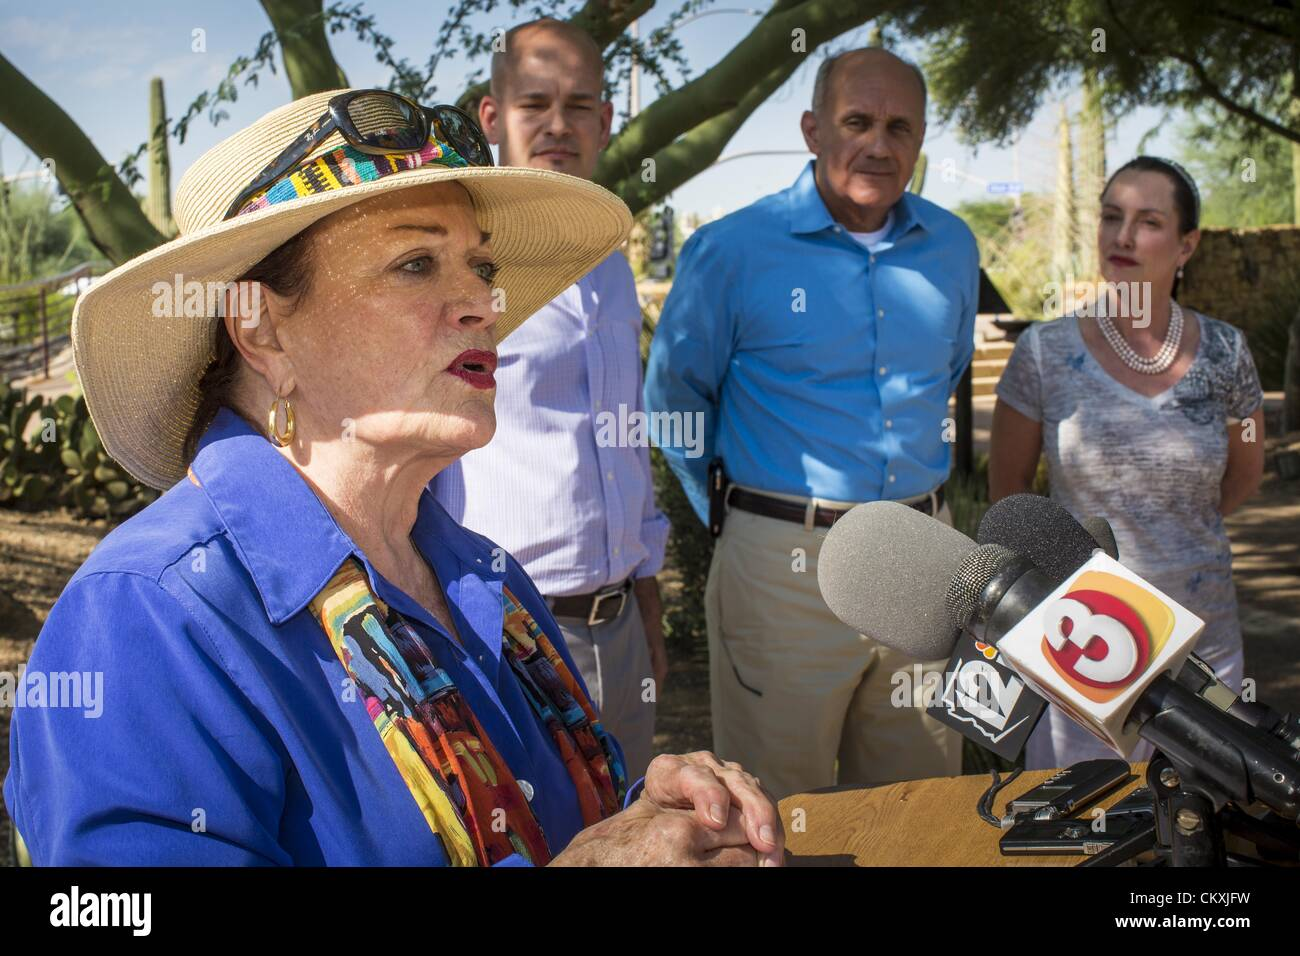 Aug. 29, 2012 - Paradise Valley, Arizona, U.S - JOANNE GOLDWATER, left, endorses Dr. RICHARD CARMONA, (center) Democratic Stock Photo